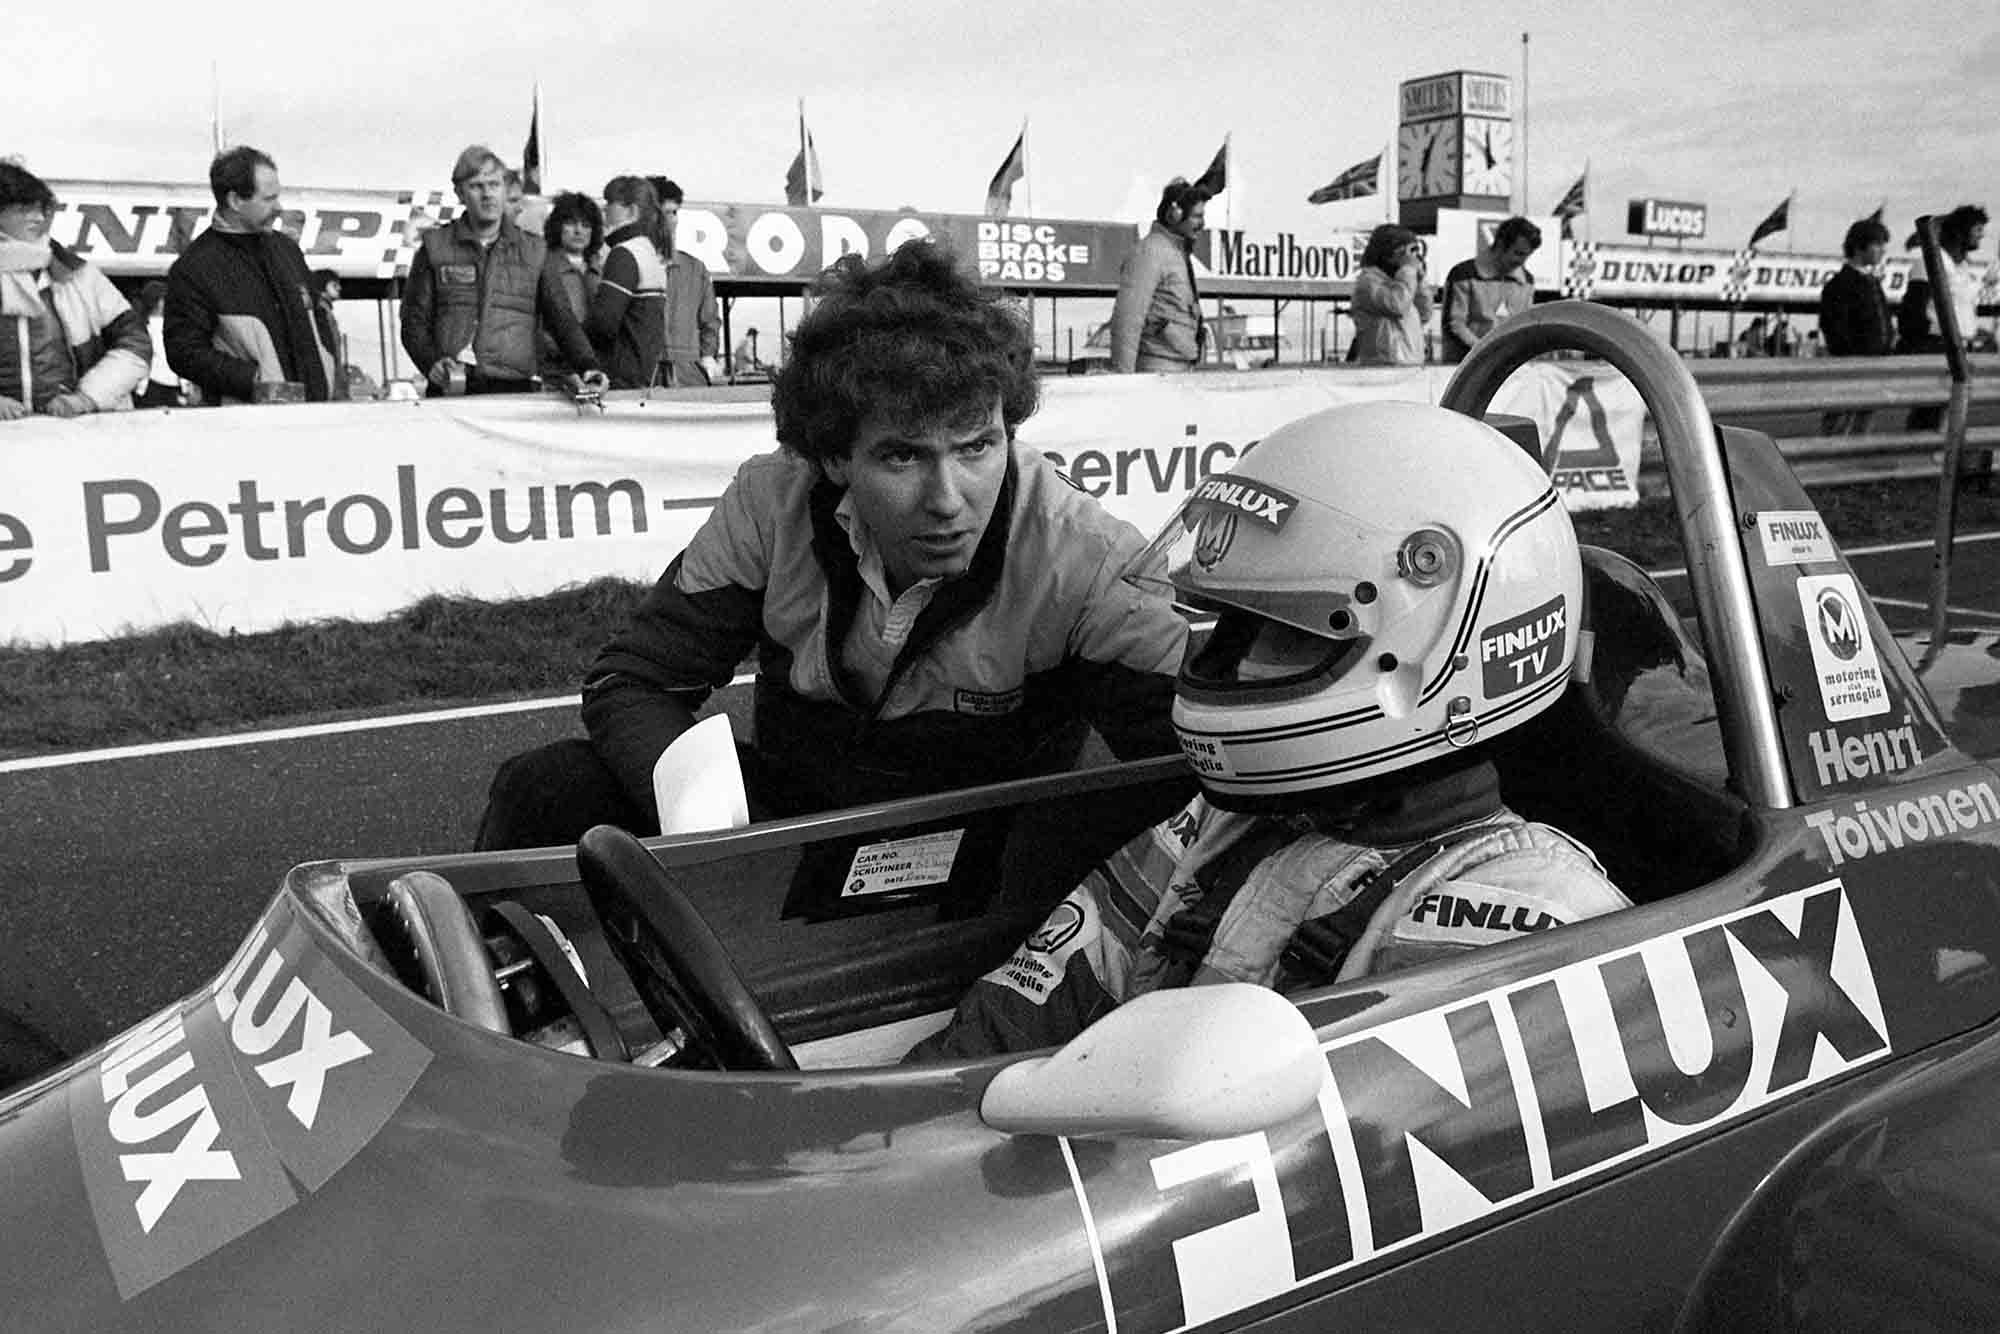 Henri Toivonen lines up on the grid for Eddie Jordan Racing in F3 Thruxton 1982